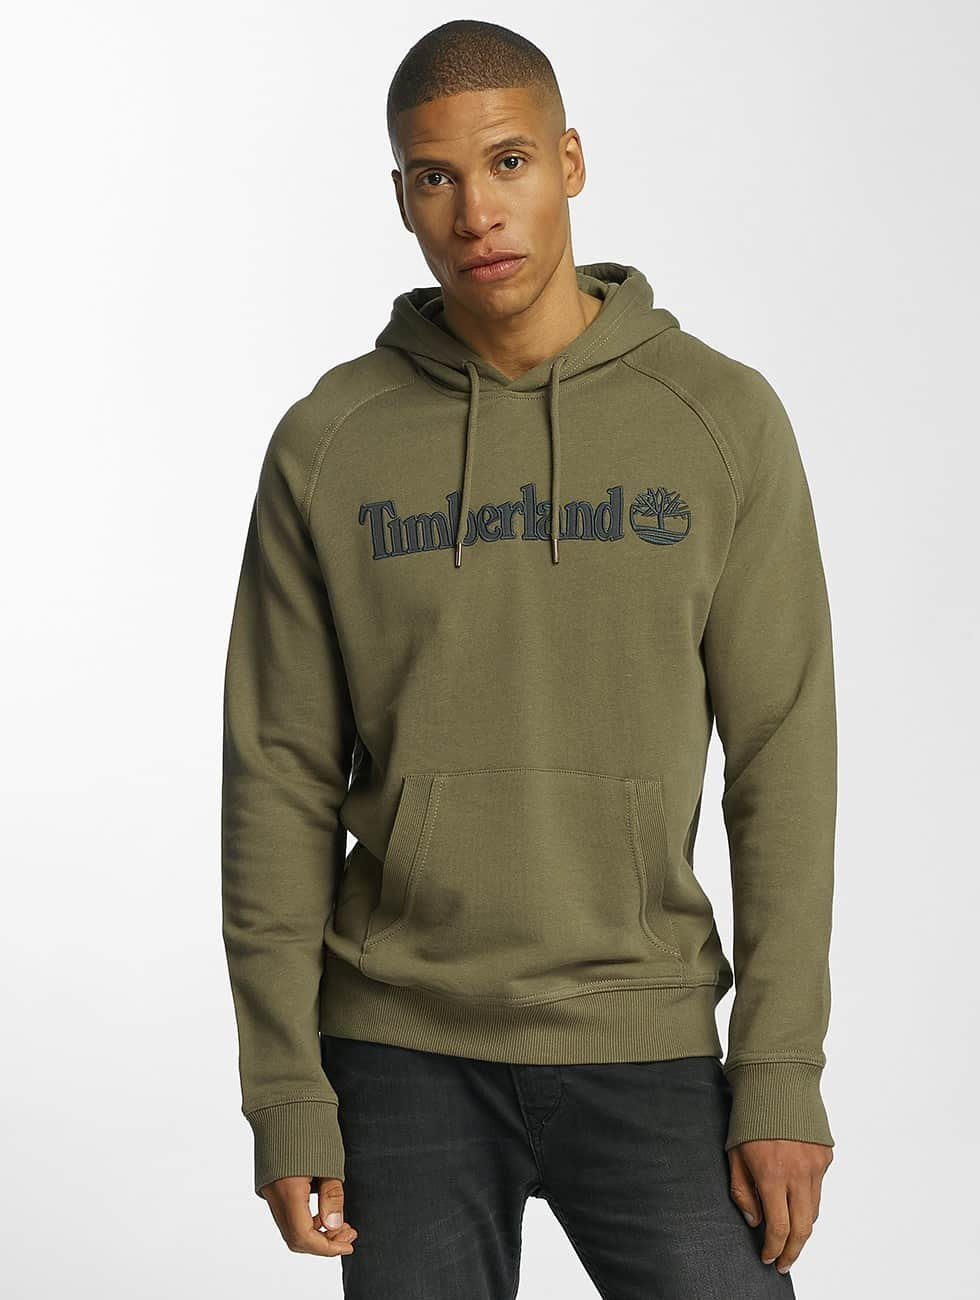 Timberland Hoodie Graph khaki